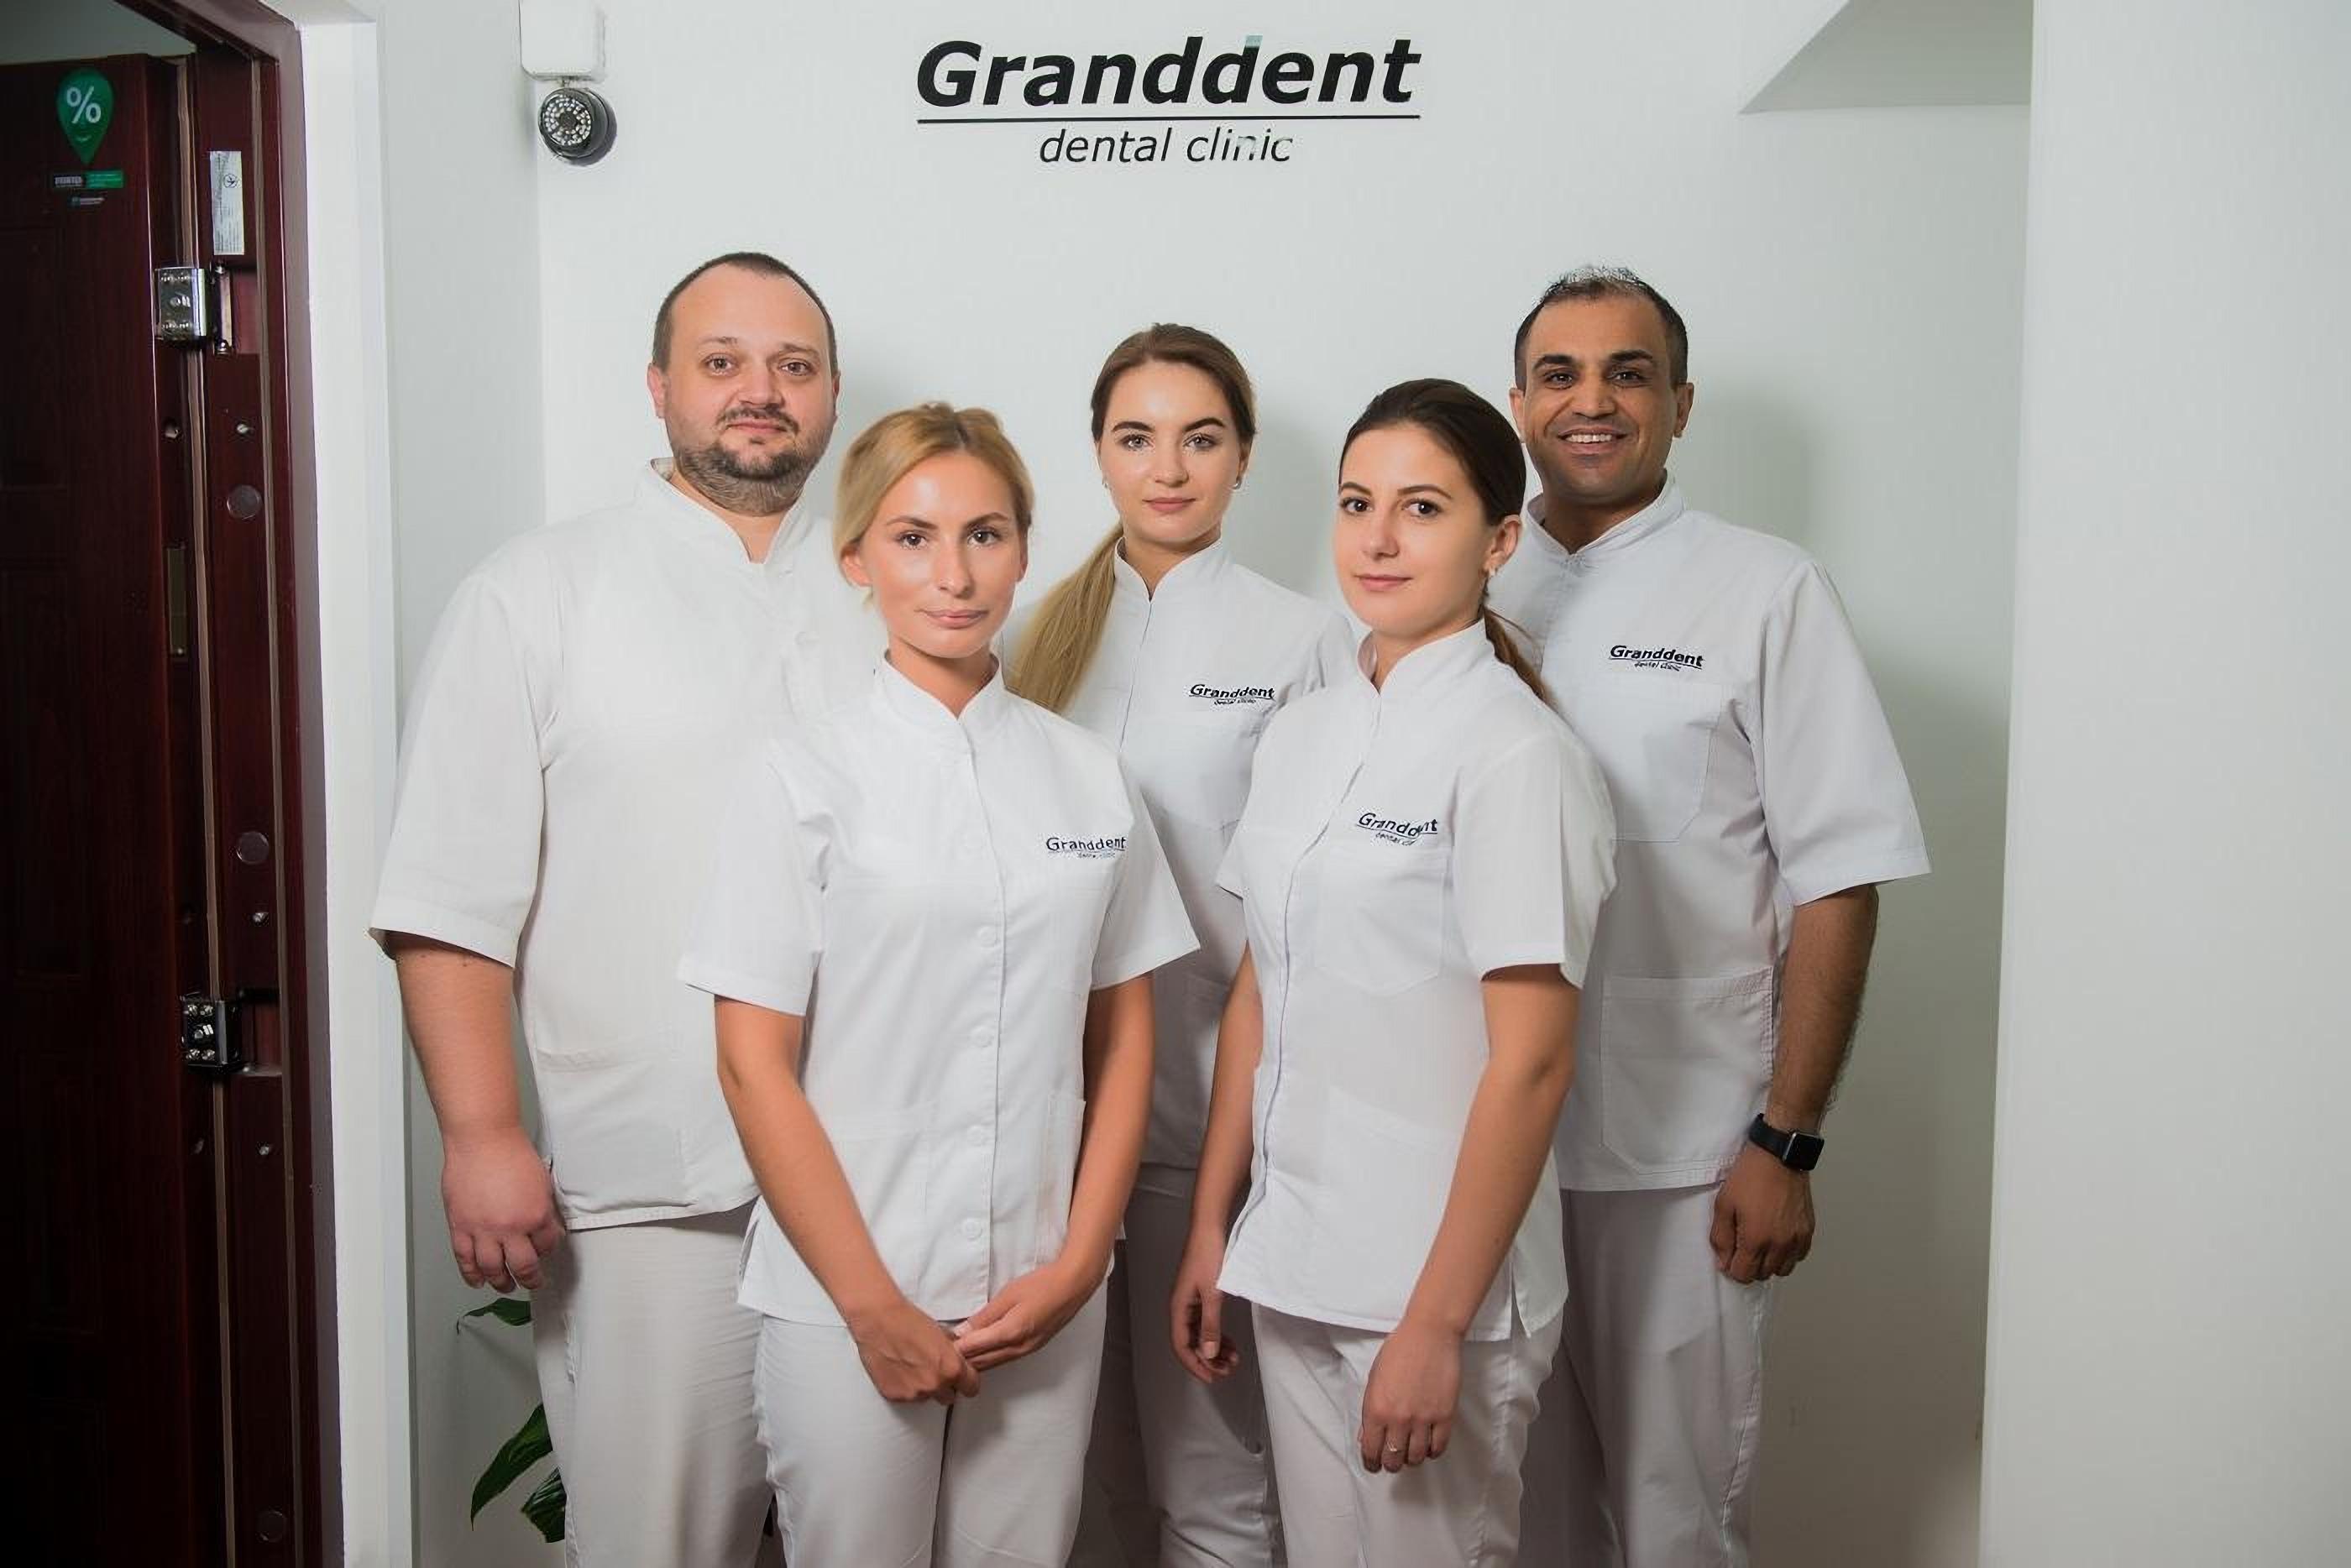 Dentists in the clinic Granddent in Odessa Ukraine